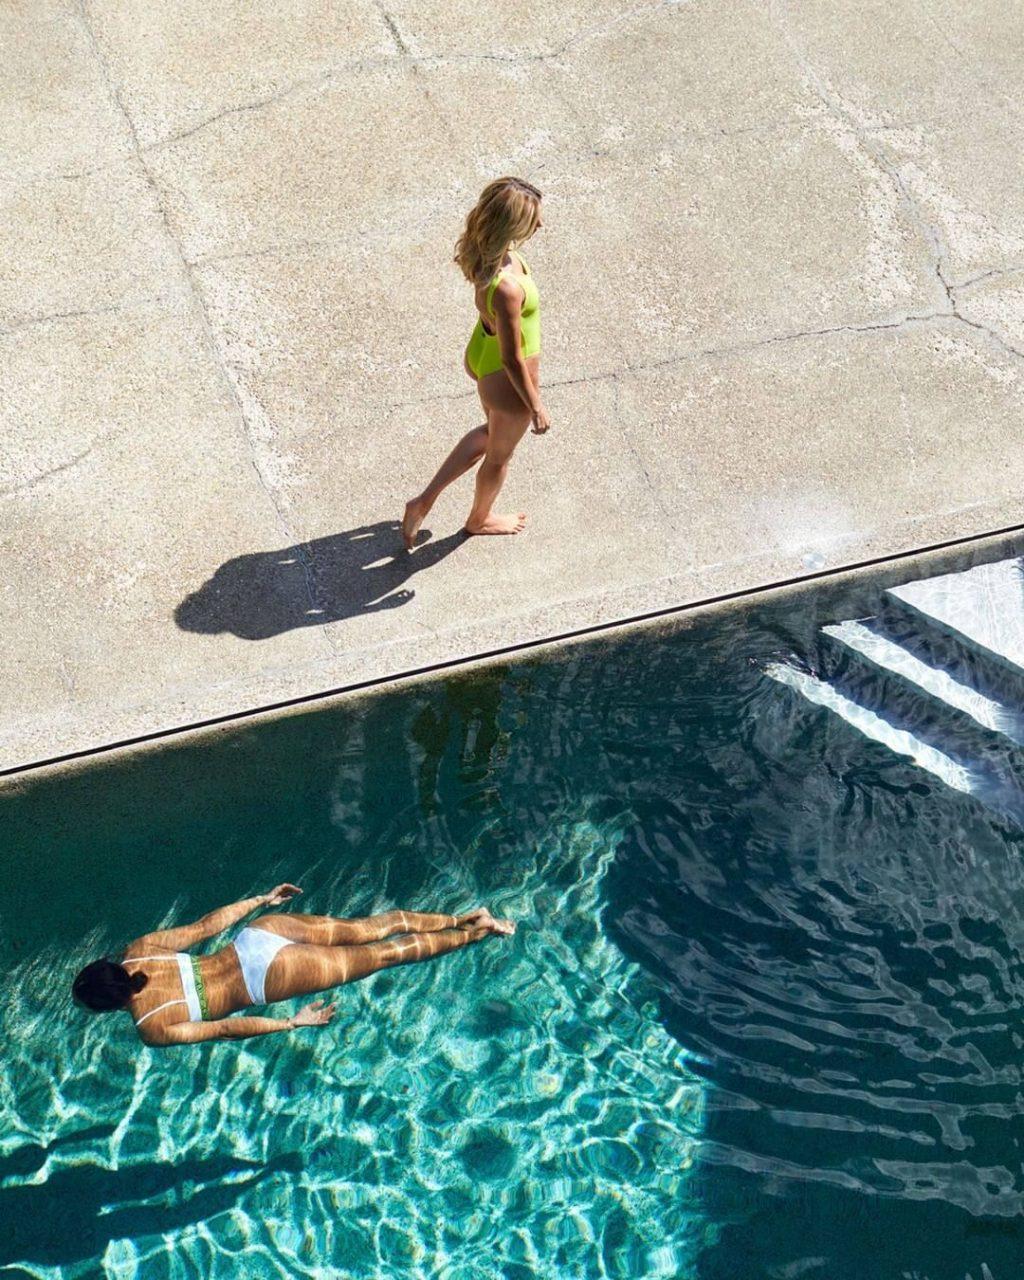 Hailey Bieber & Kelia Termini Pose for Roxy x Sister Summer 2020 Campaign (26 Photos + Videos)